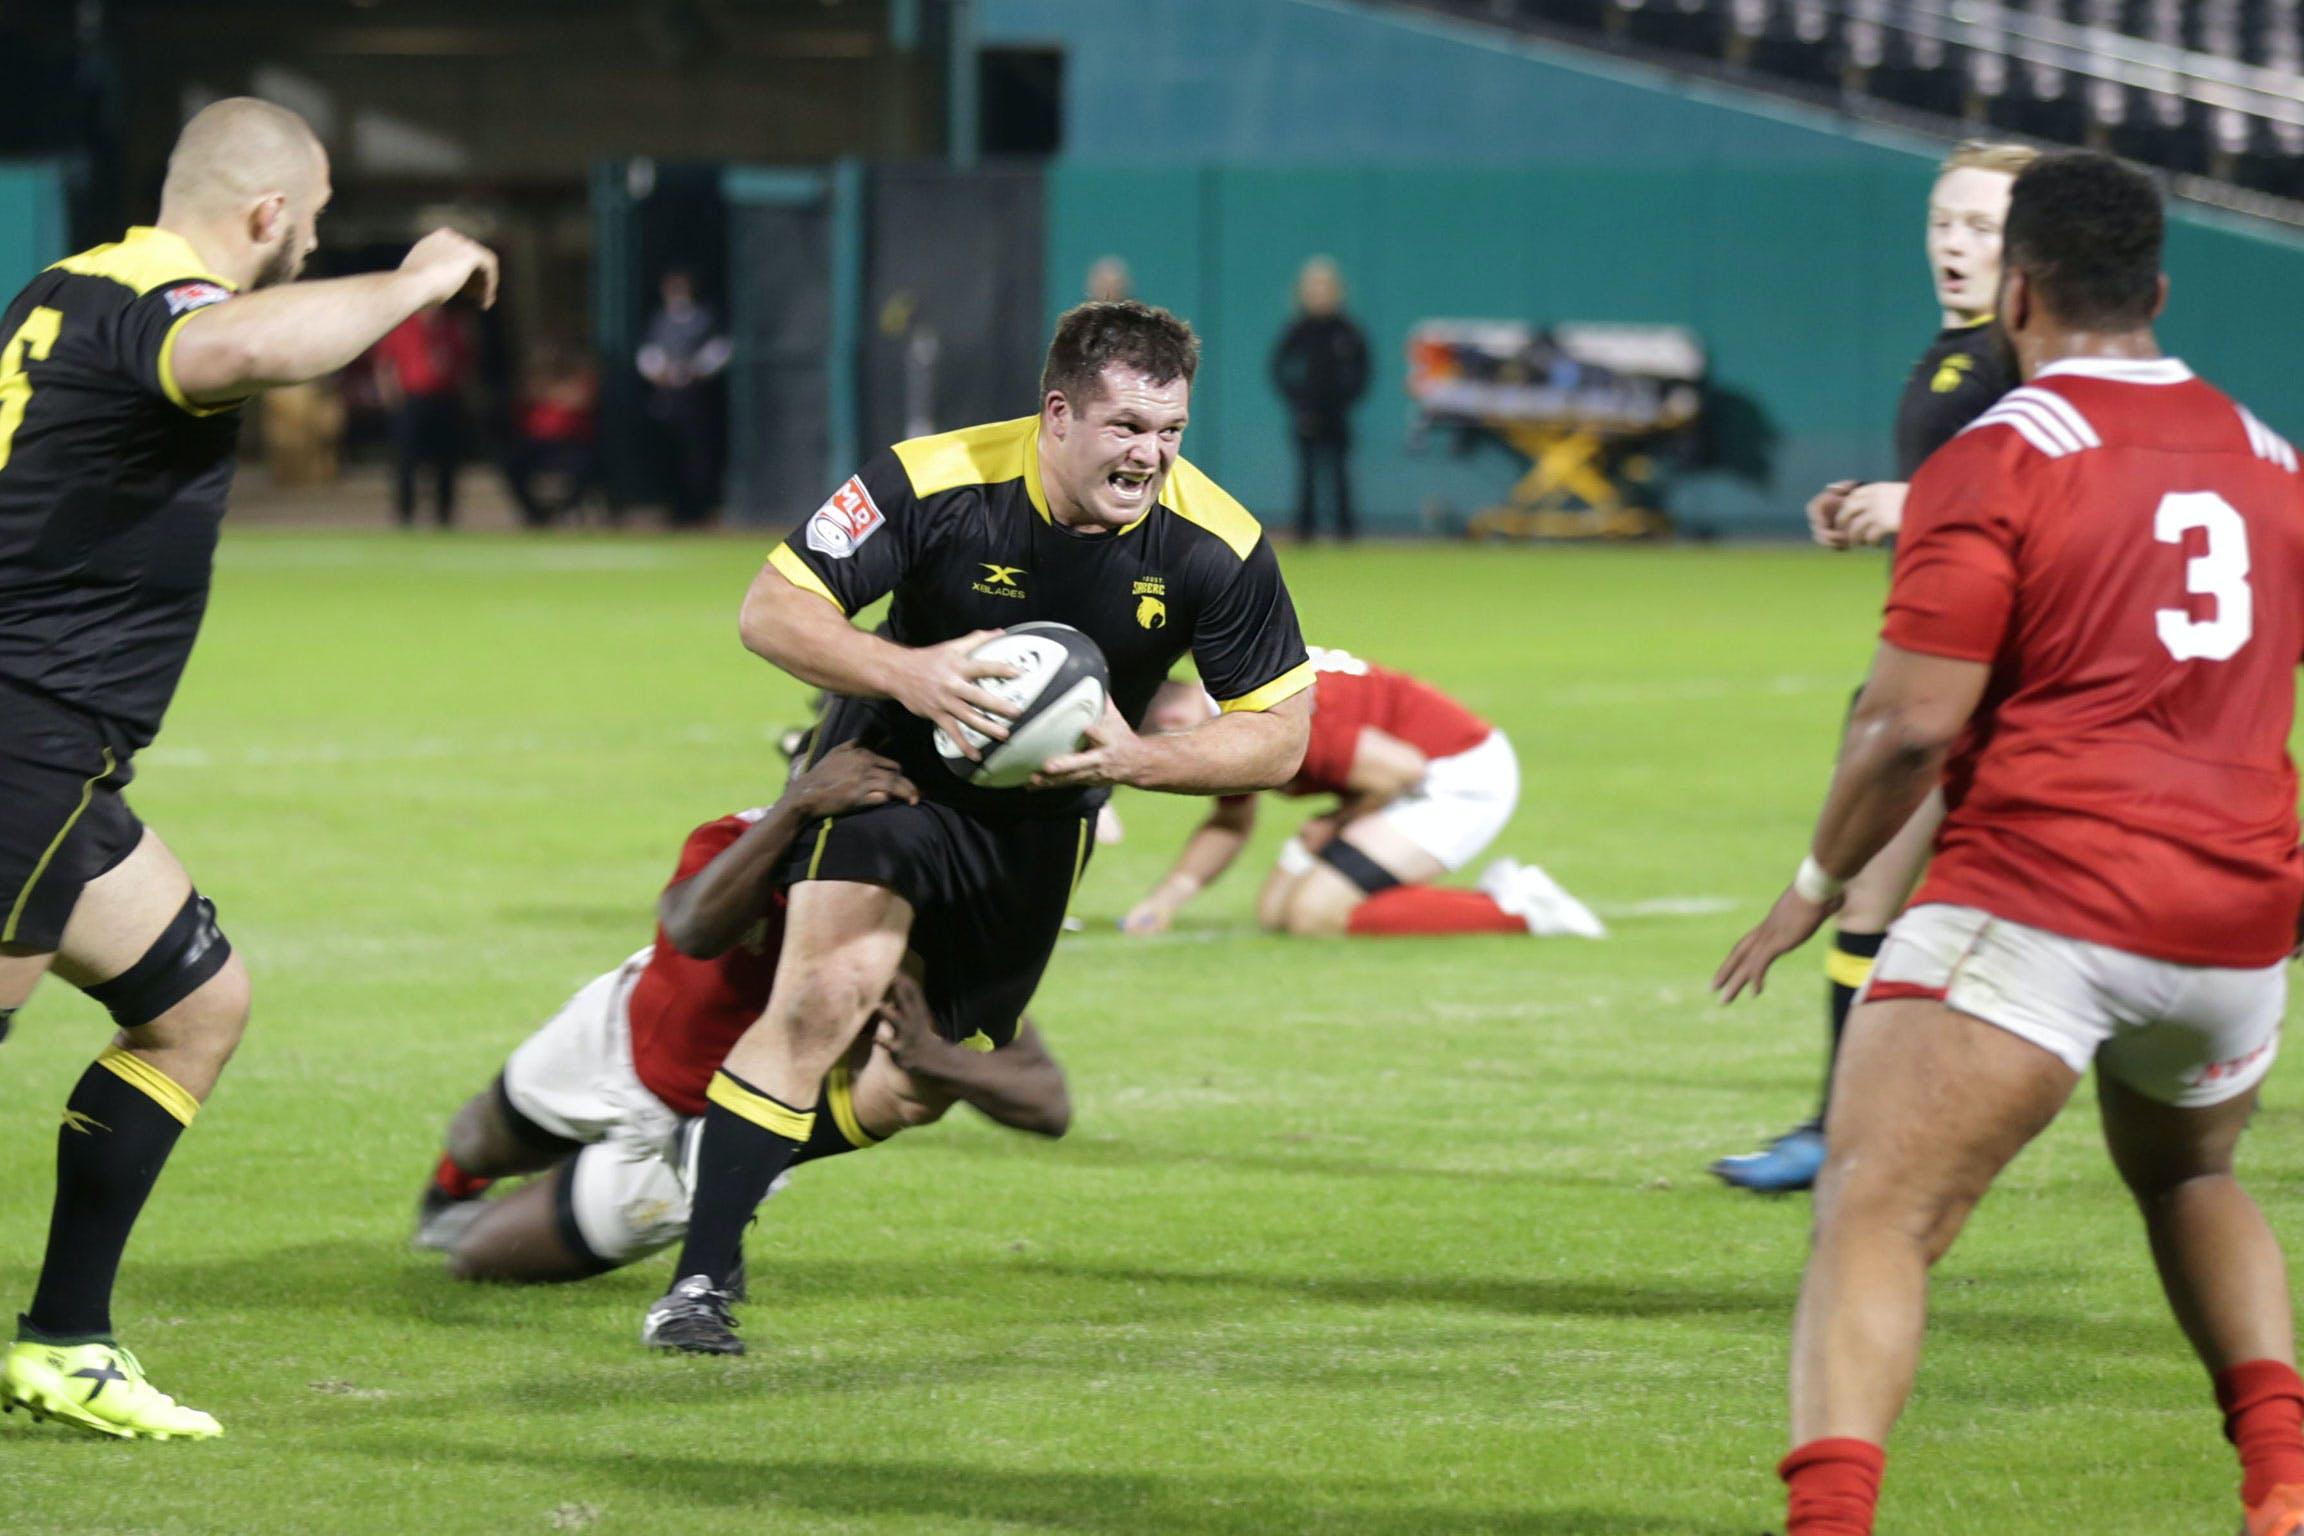 houston-sabercats-rugby-2018-sugar-land-tx